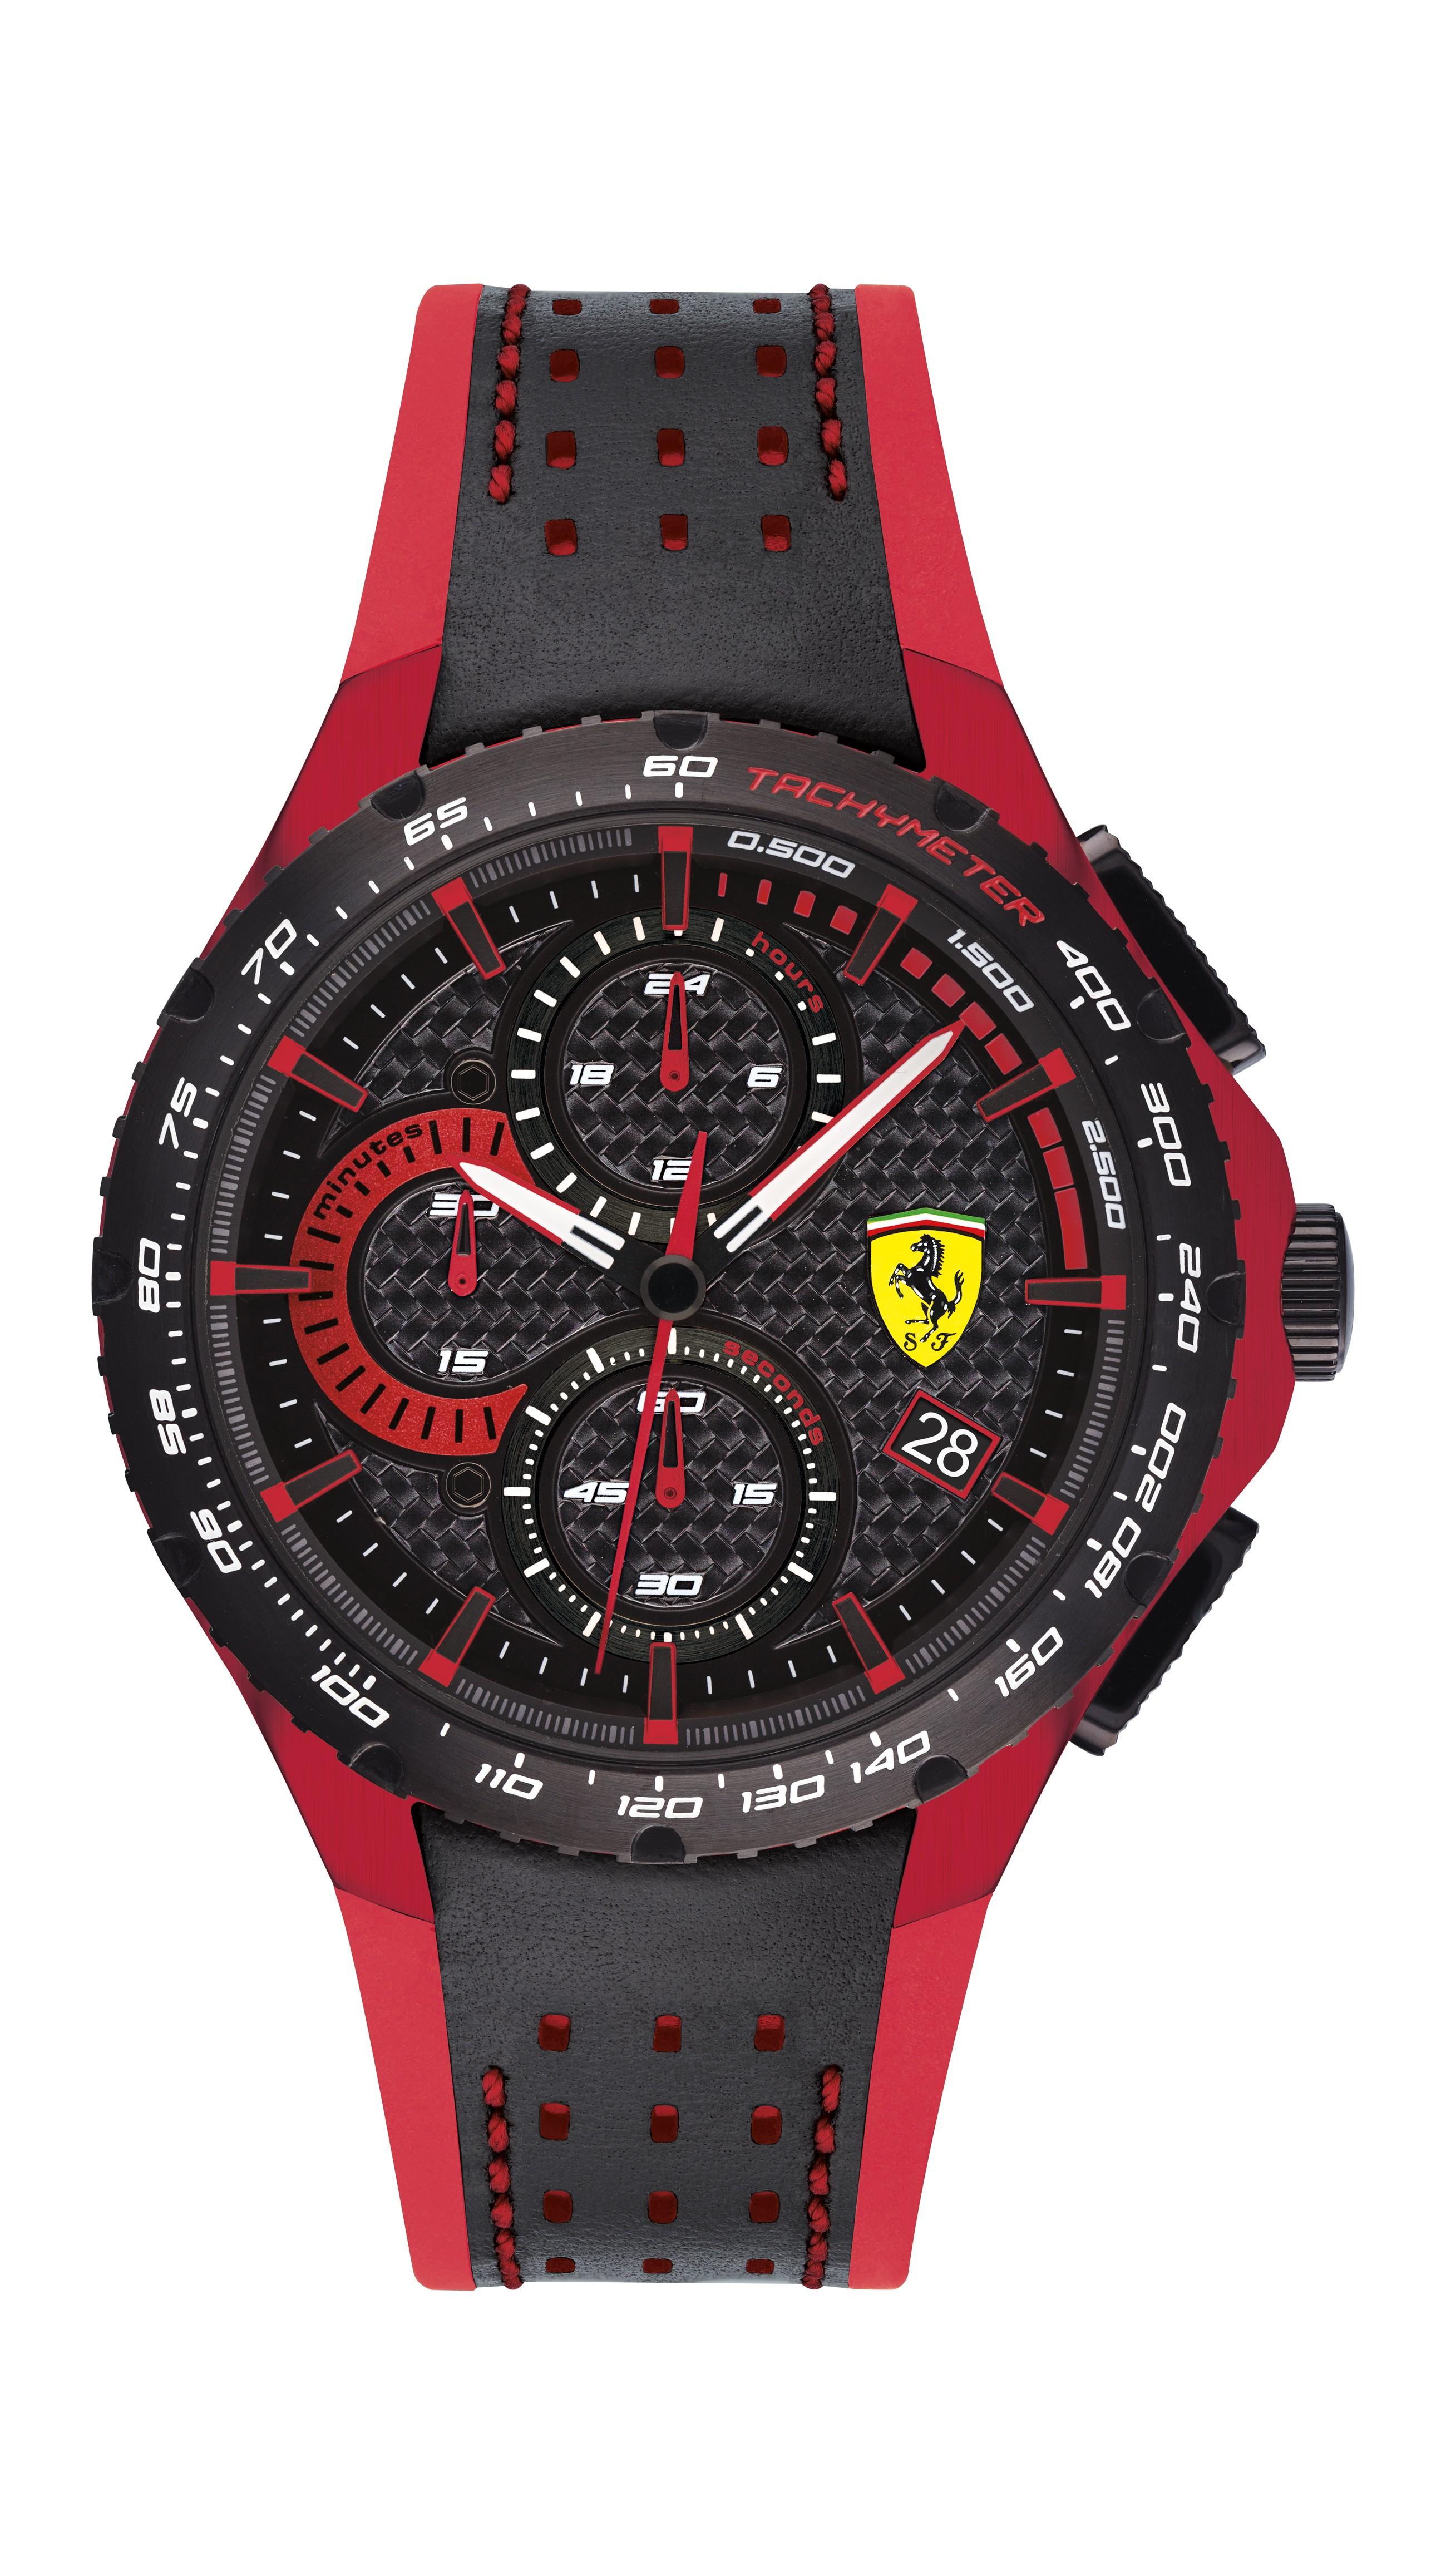 Scuderia Ferrari Pista黑色/紅色男士手錶(830733)